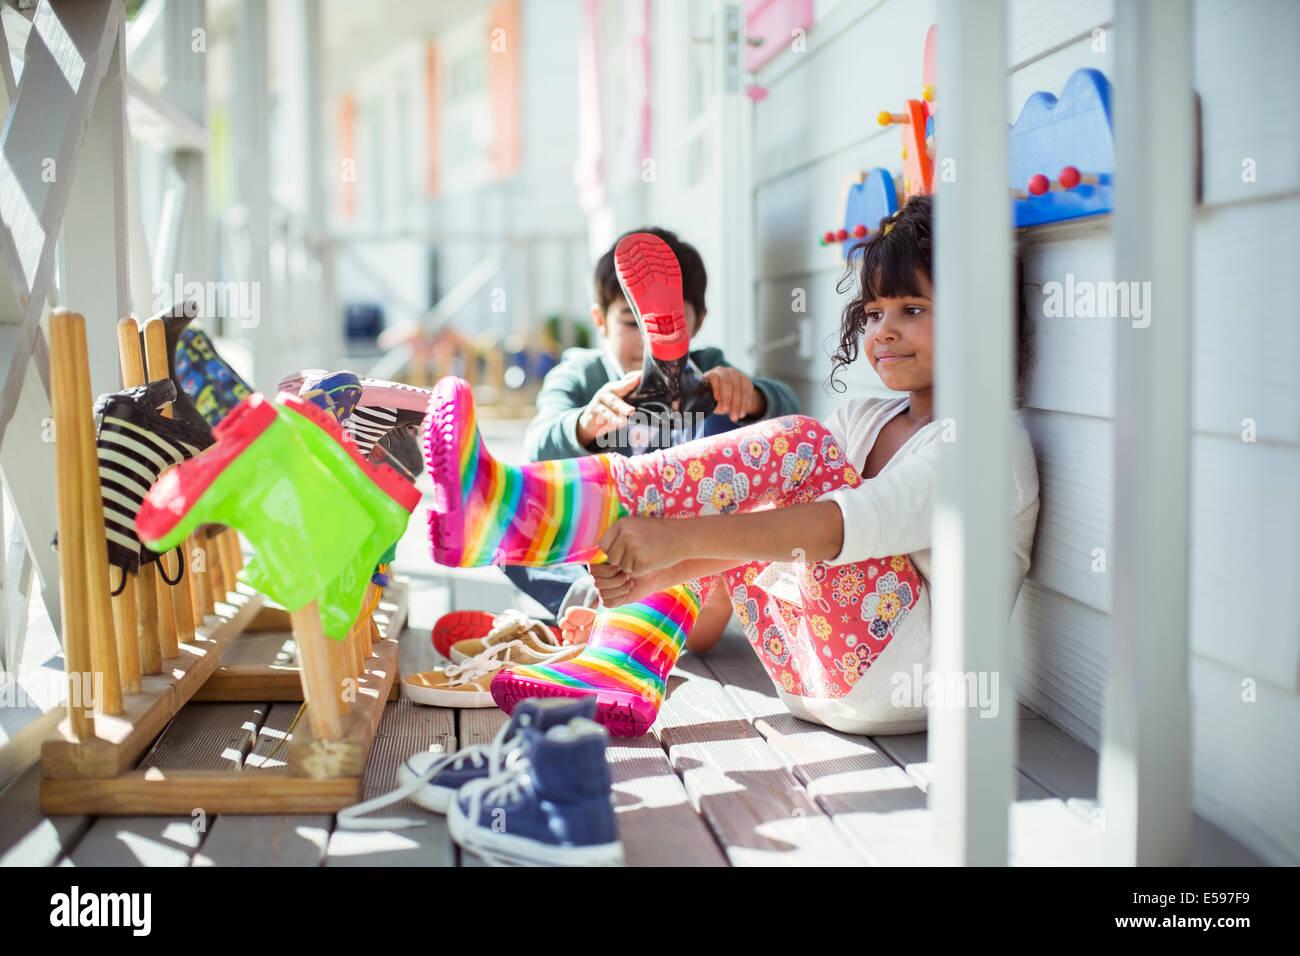 Kinder ziehen am Lackoptik auf Veranda Stockfoto